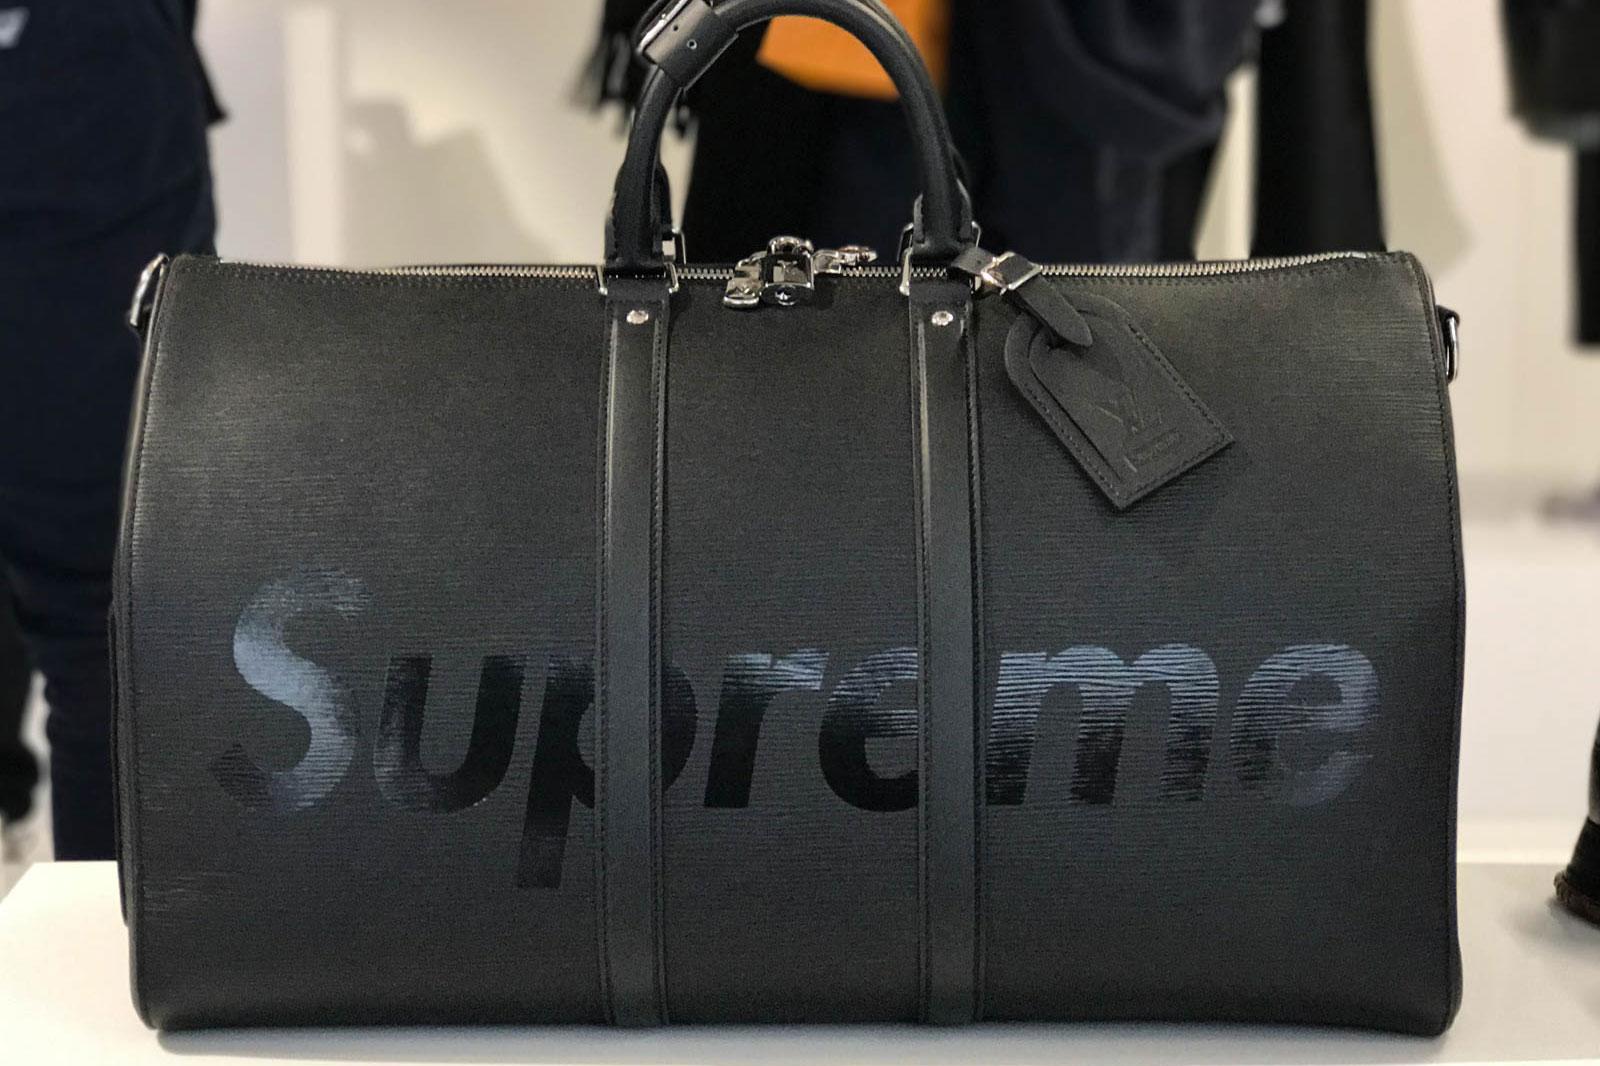 Supreme x Louis Vuitton 2017 Fall/Winter Closer Look Showroom - 3703542